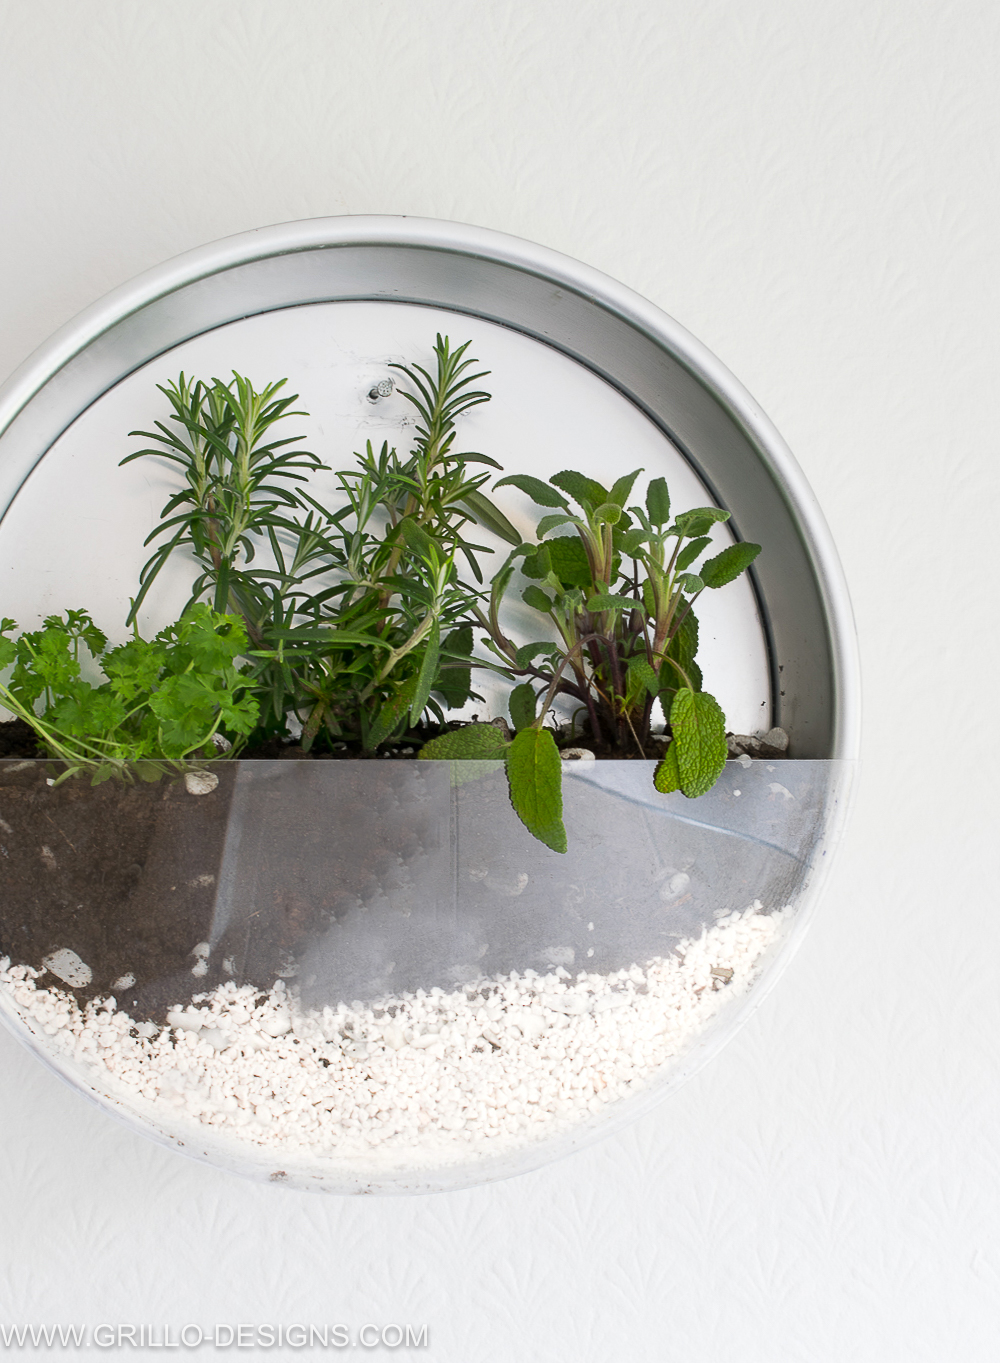 diy indoor herb planter attached to wall / grillo designs www.grillo-designs.com